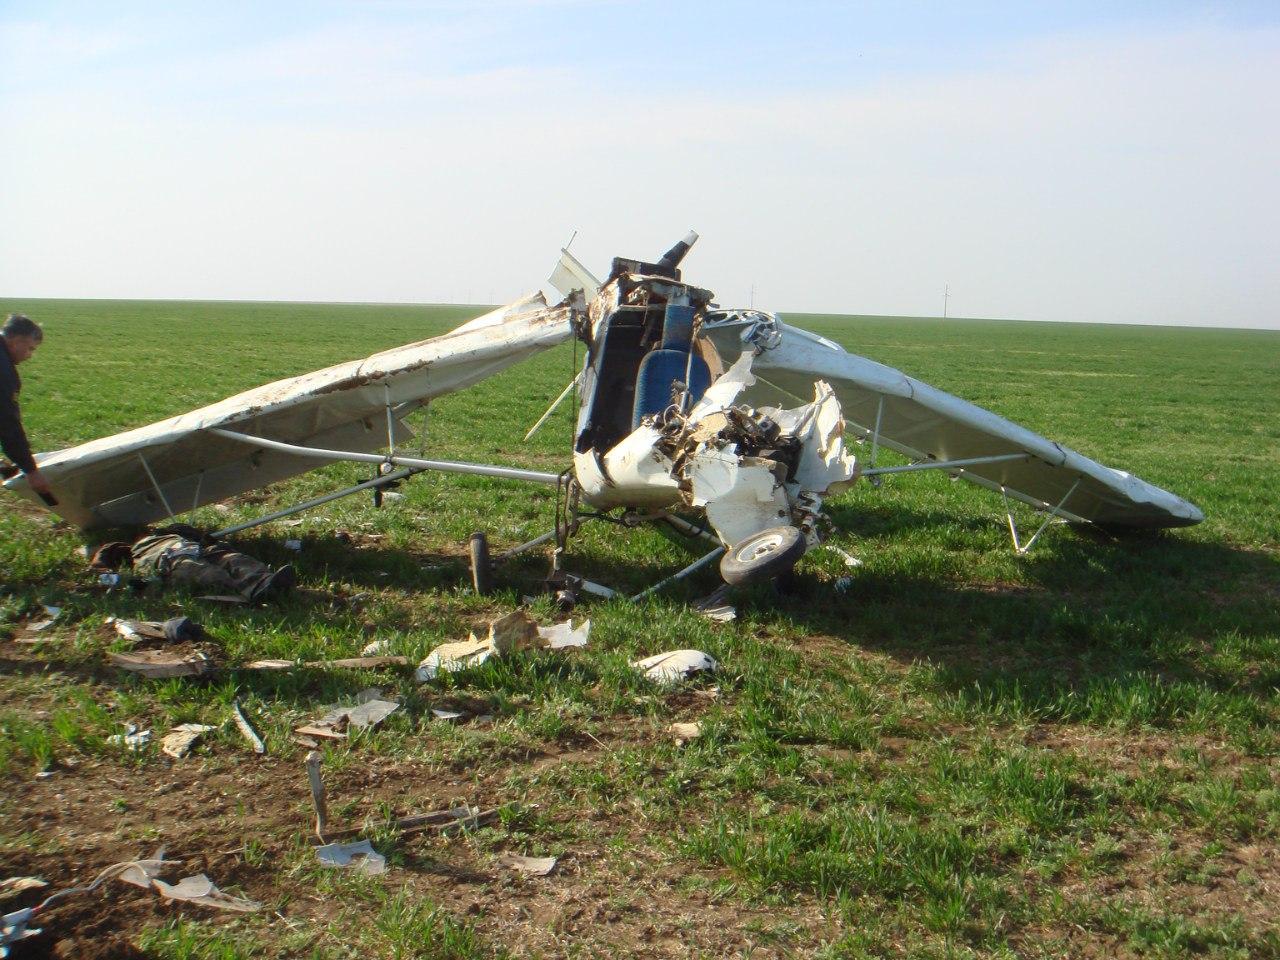 упал самолет Х-32 БЕКАС